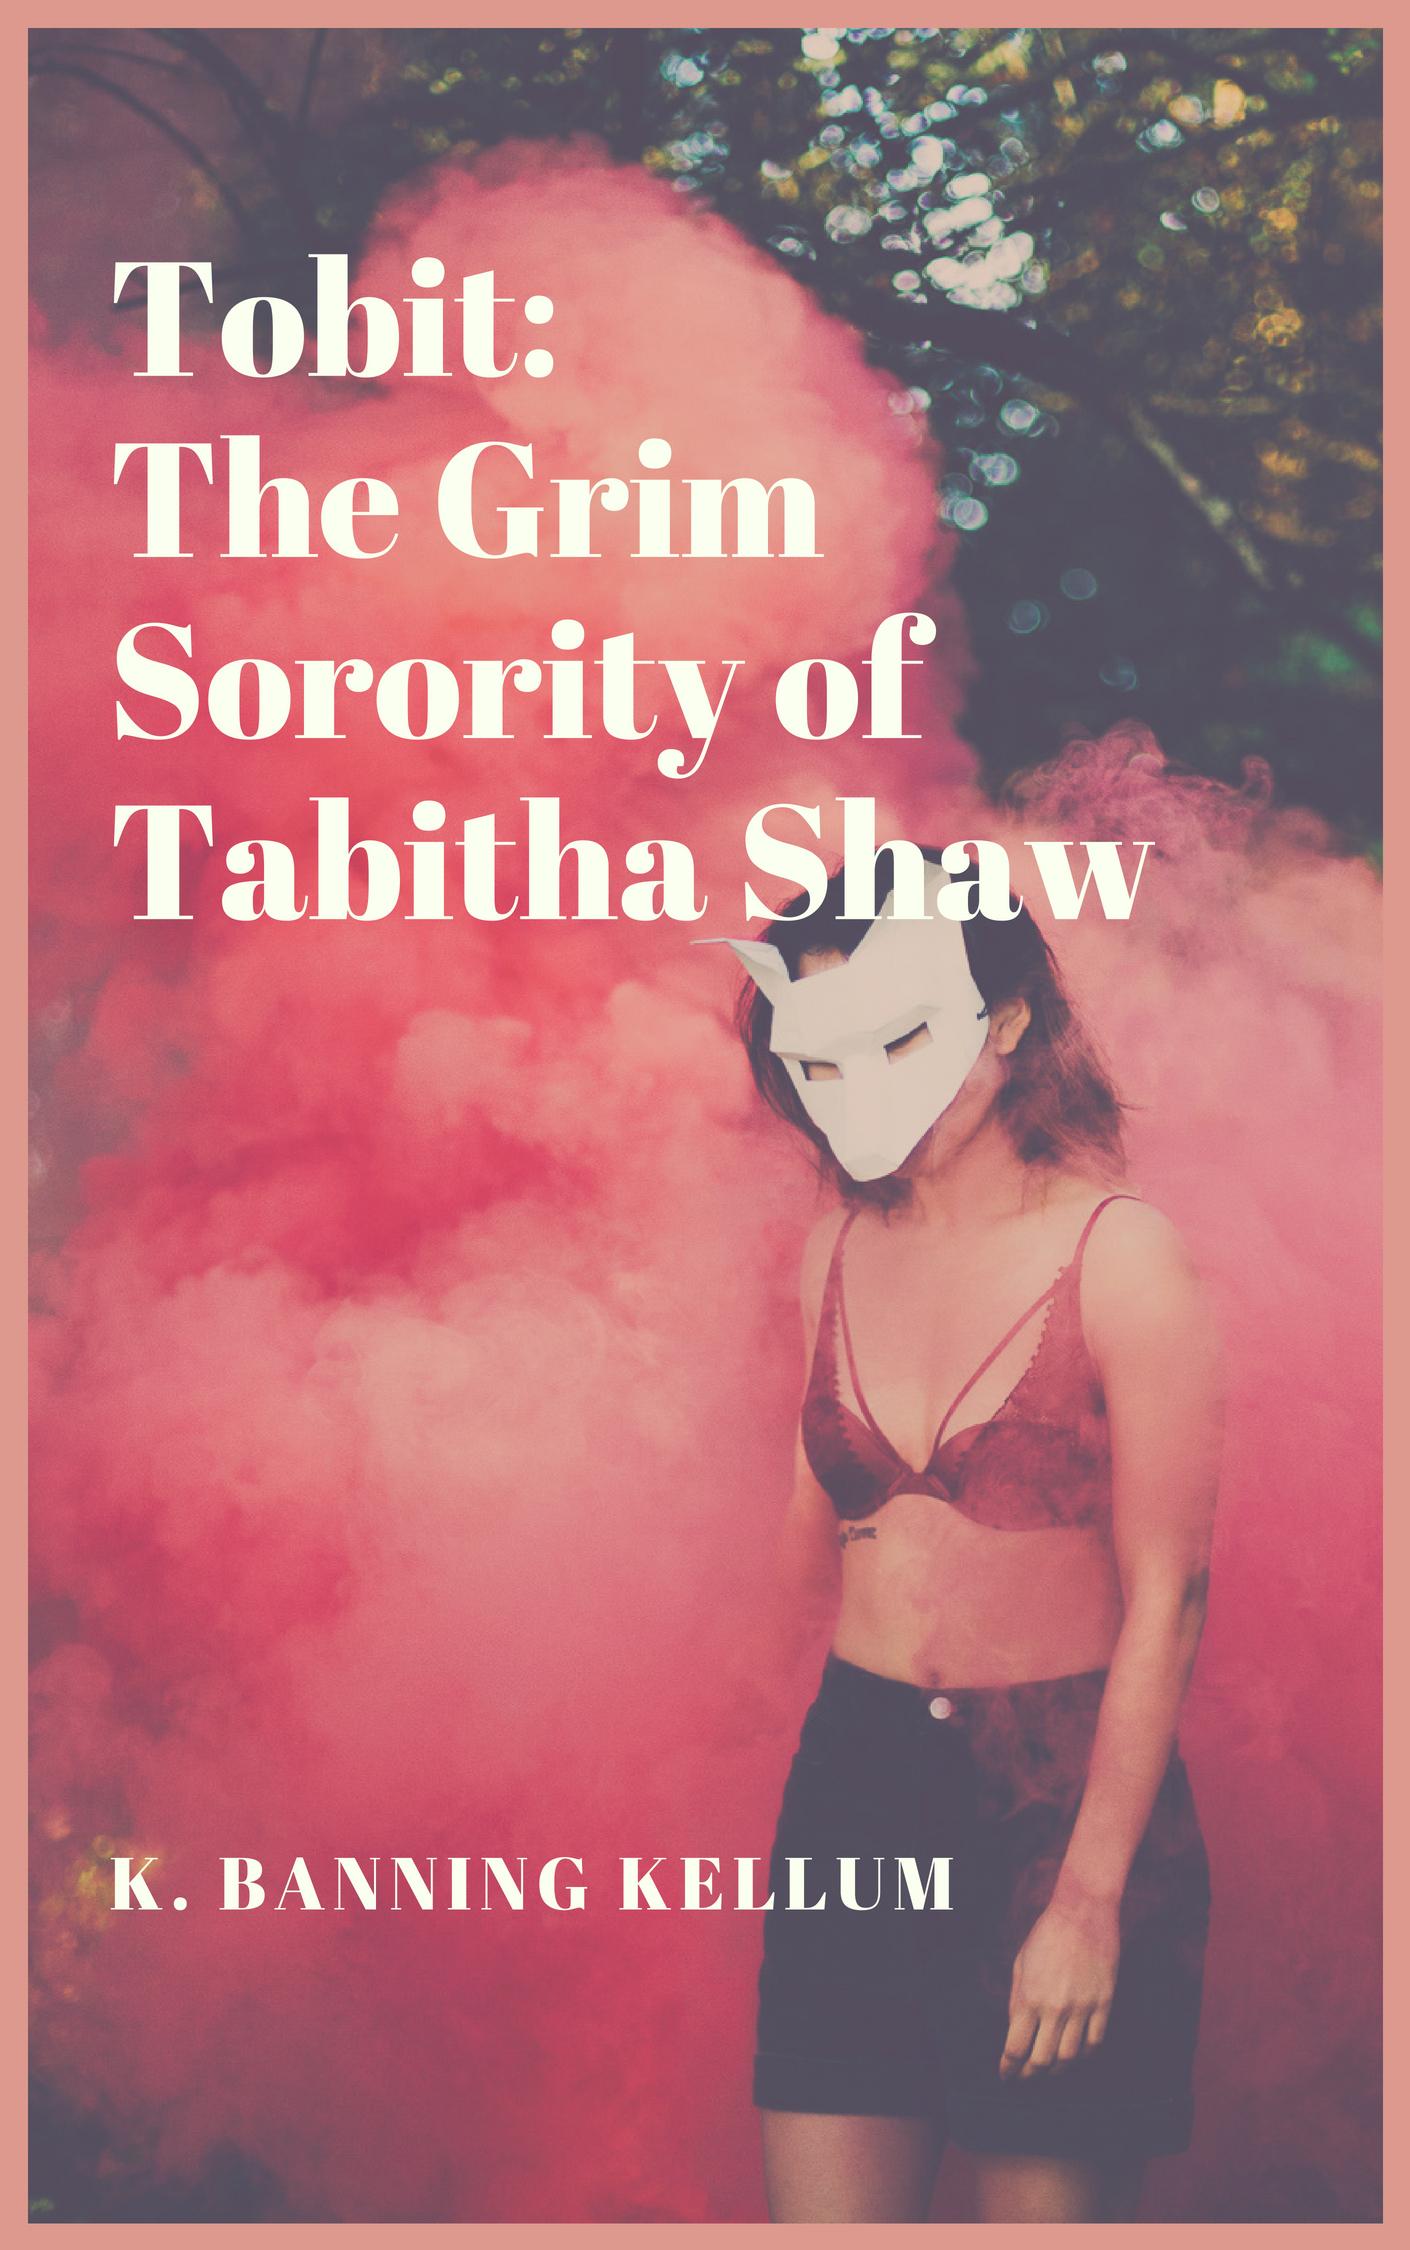 f7036a222e Tobit: The Grim Sorority of Tabitha Shaw | Creepypasta Wiki | FANDOM ...